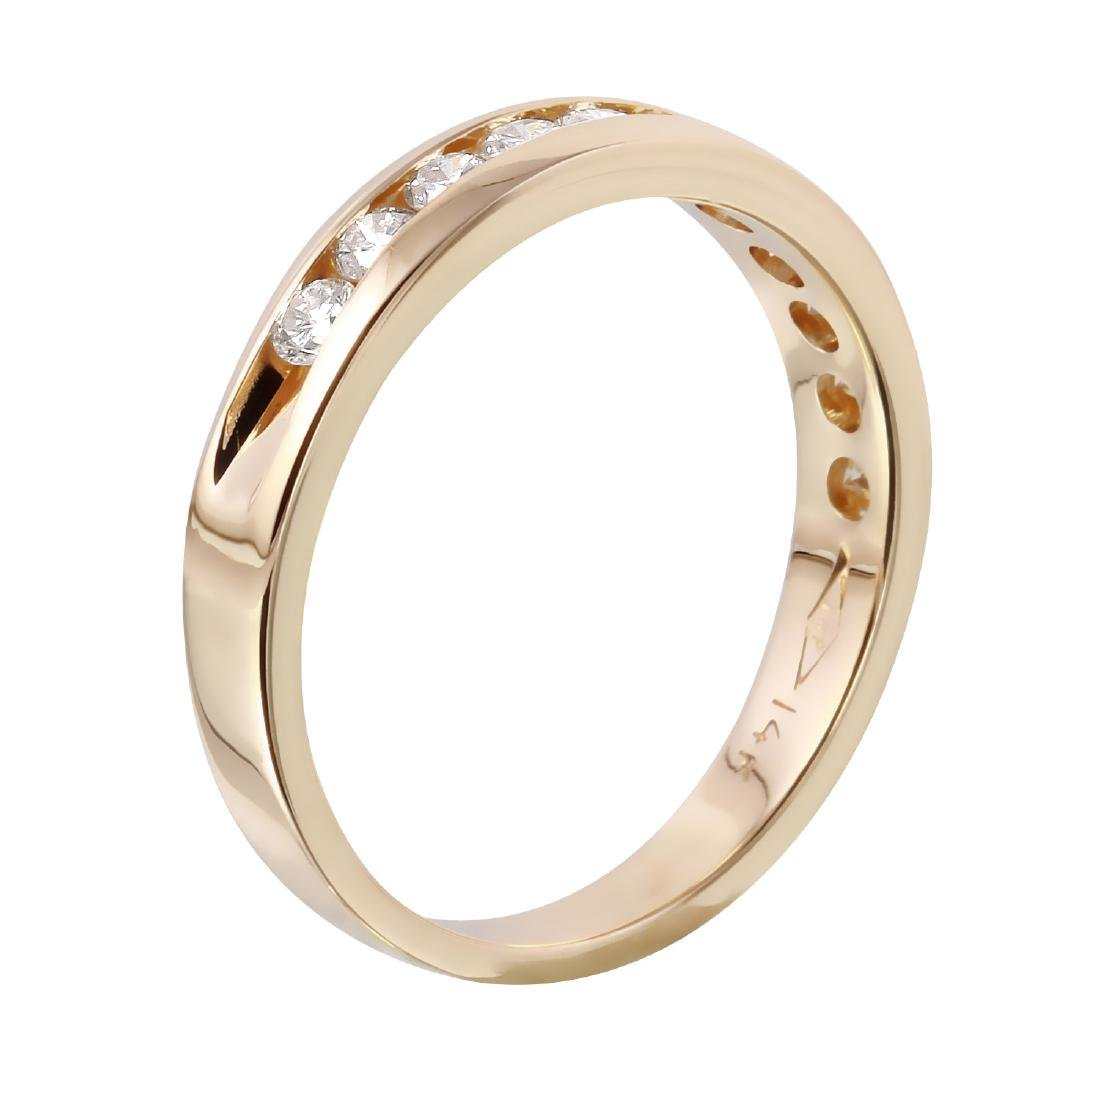 14KT Yellow Gold 0.45ctw Diamond Wedding Band Size 6.25 - 2